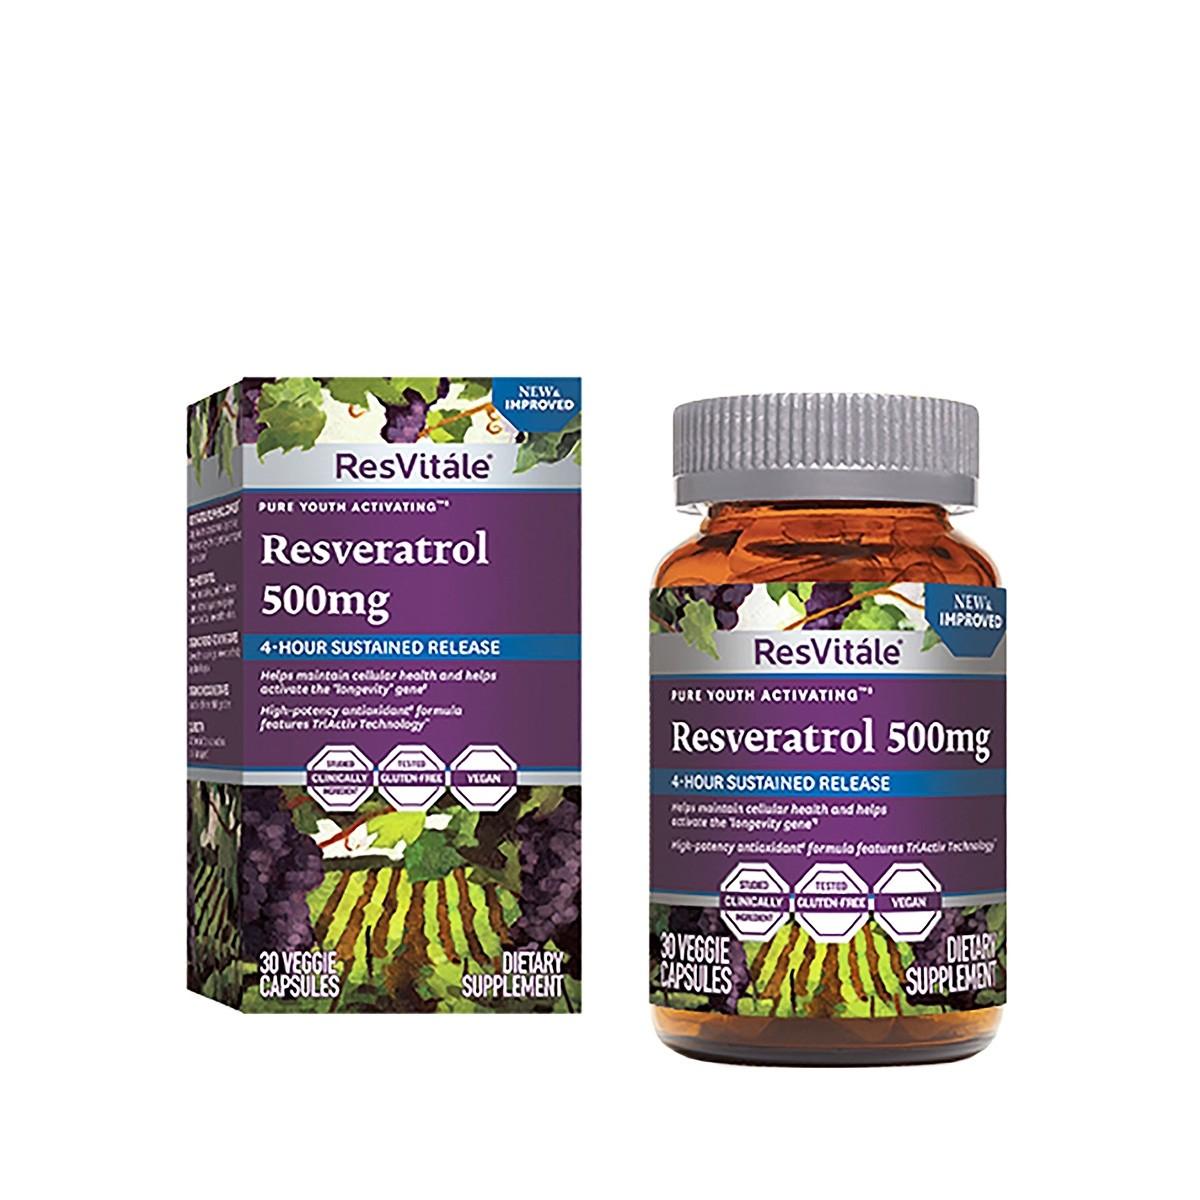 Resveratrol 500mg, 30 capsule, GNC imagine produs 2021